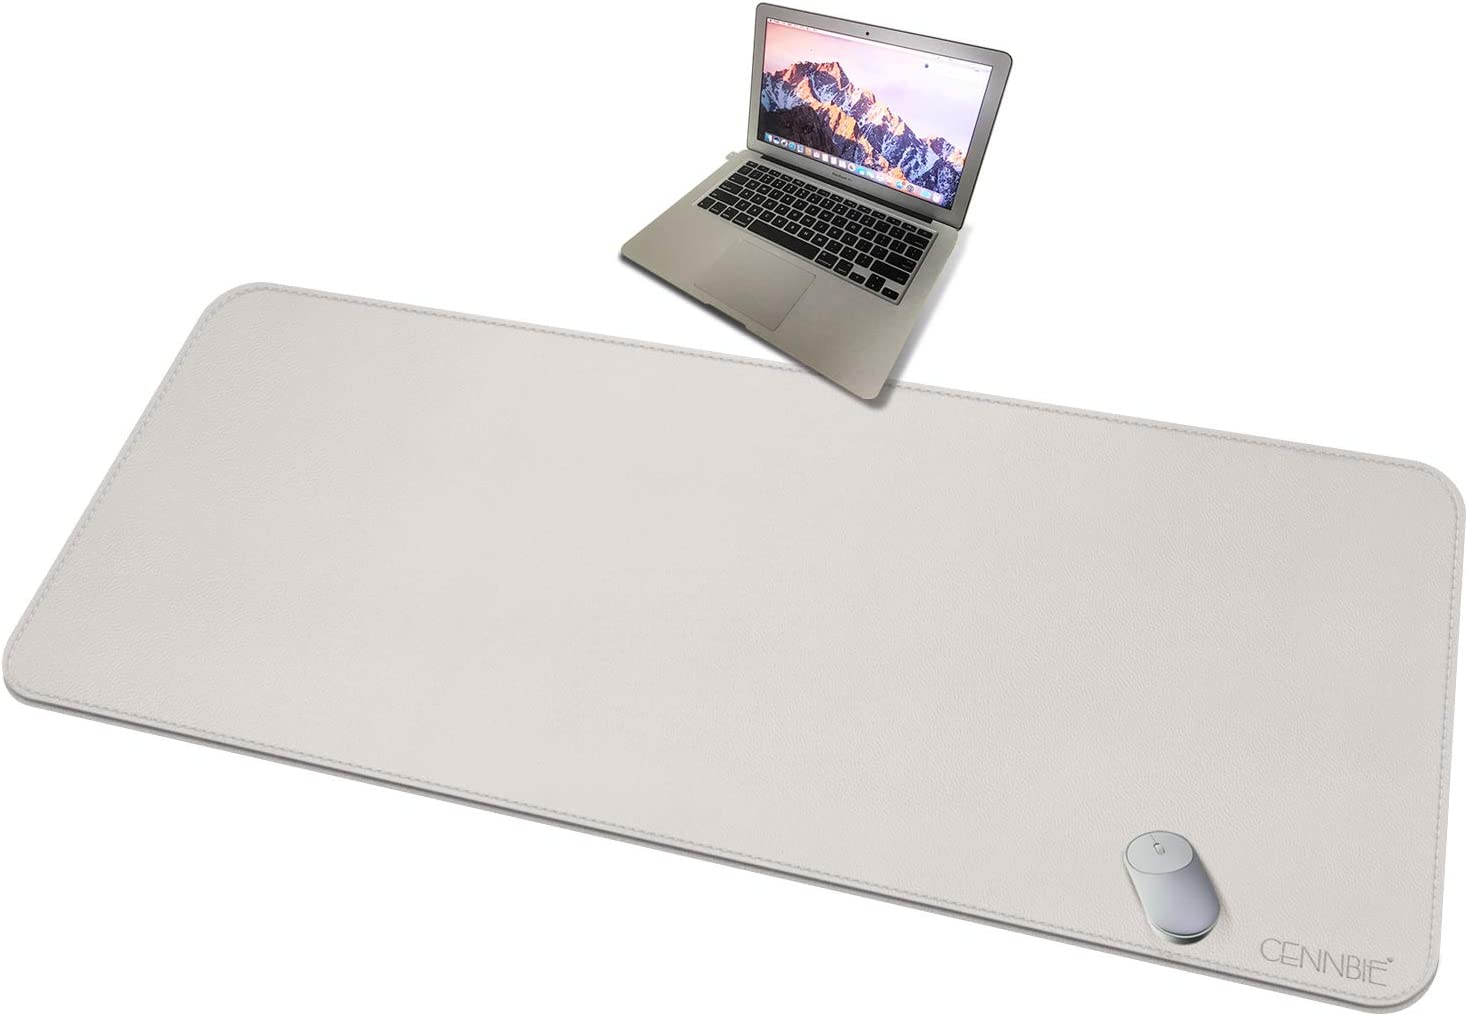 CENNBIE 150x70cm 4XL Super Large Desk Mat - Mega Size Premium Vegan Leather Desk Pad - Ultra Ergocomfort Technology (Cream)